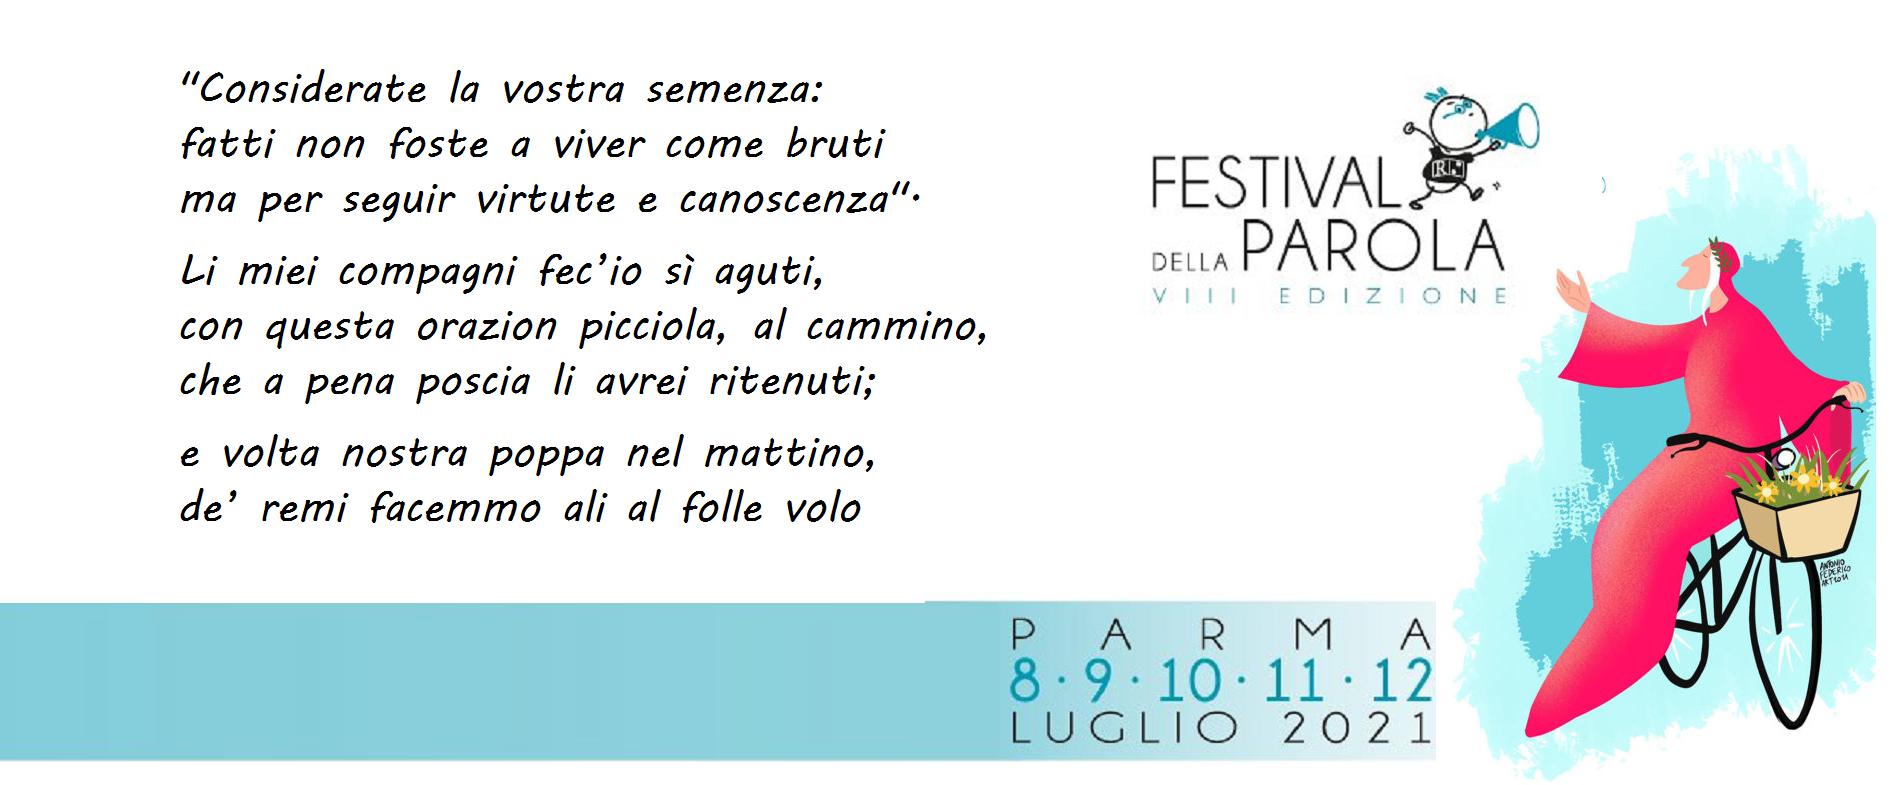 Festival della Parola Parma